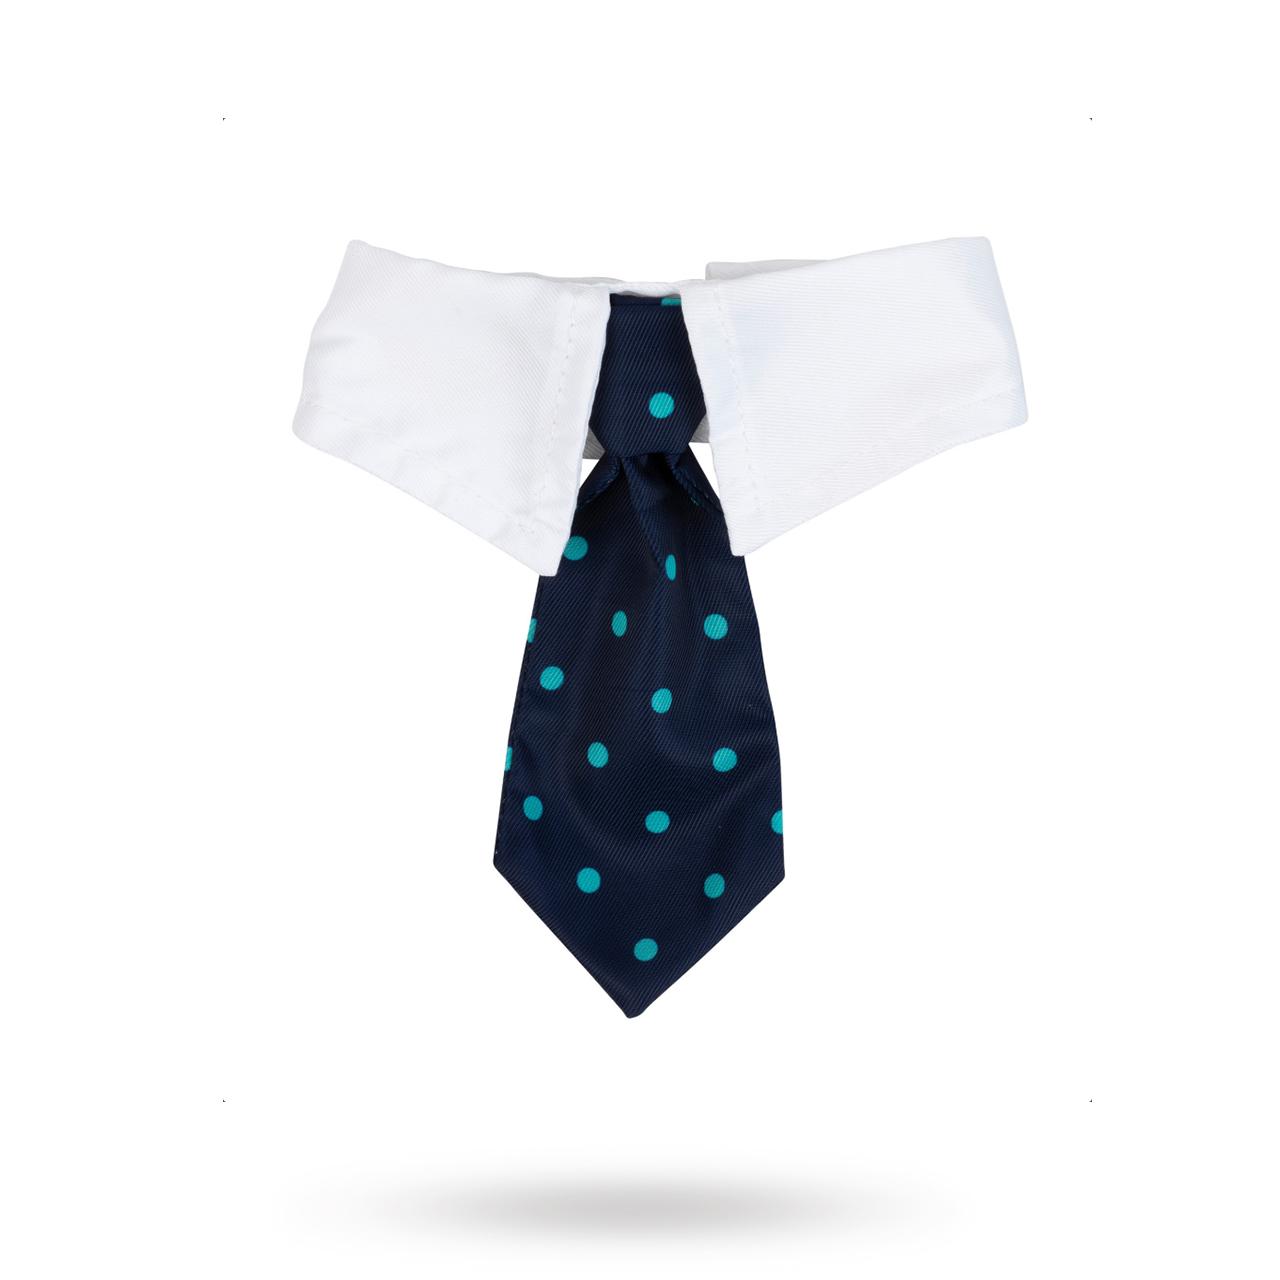 Mr. Carrington Necktie